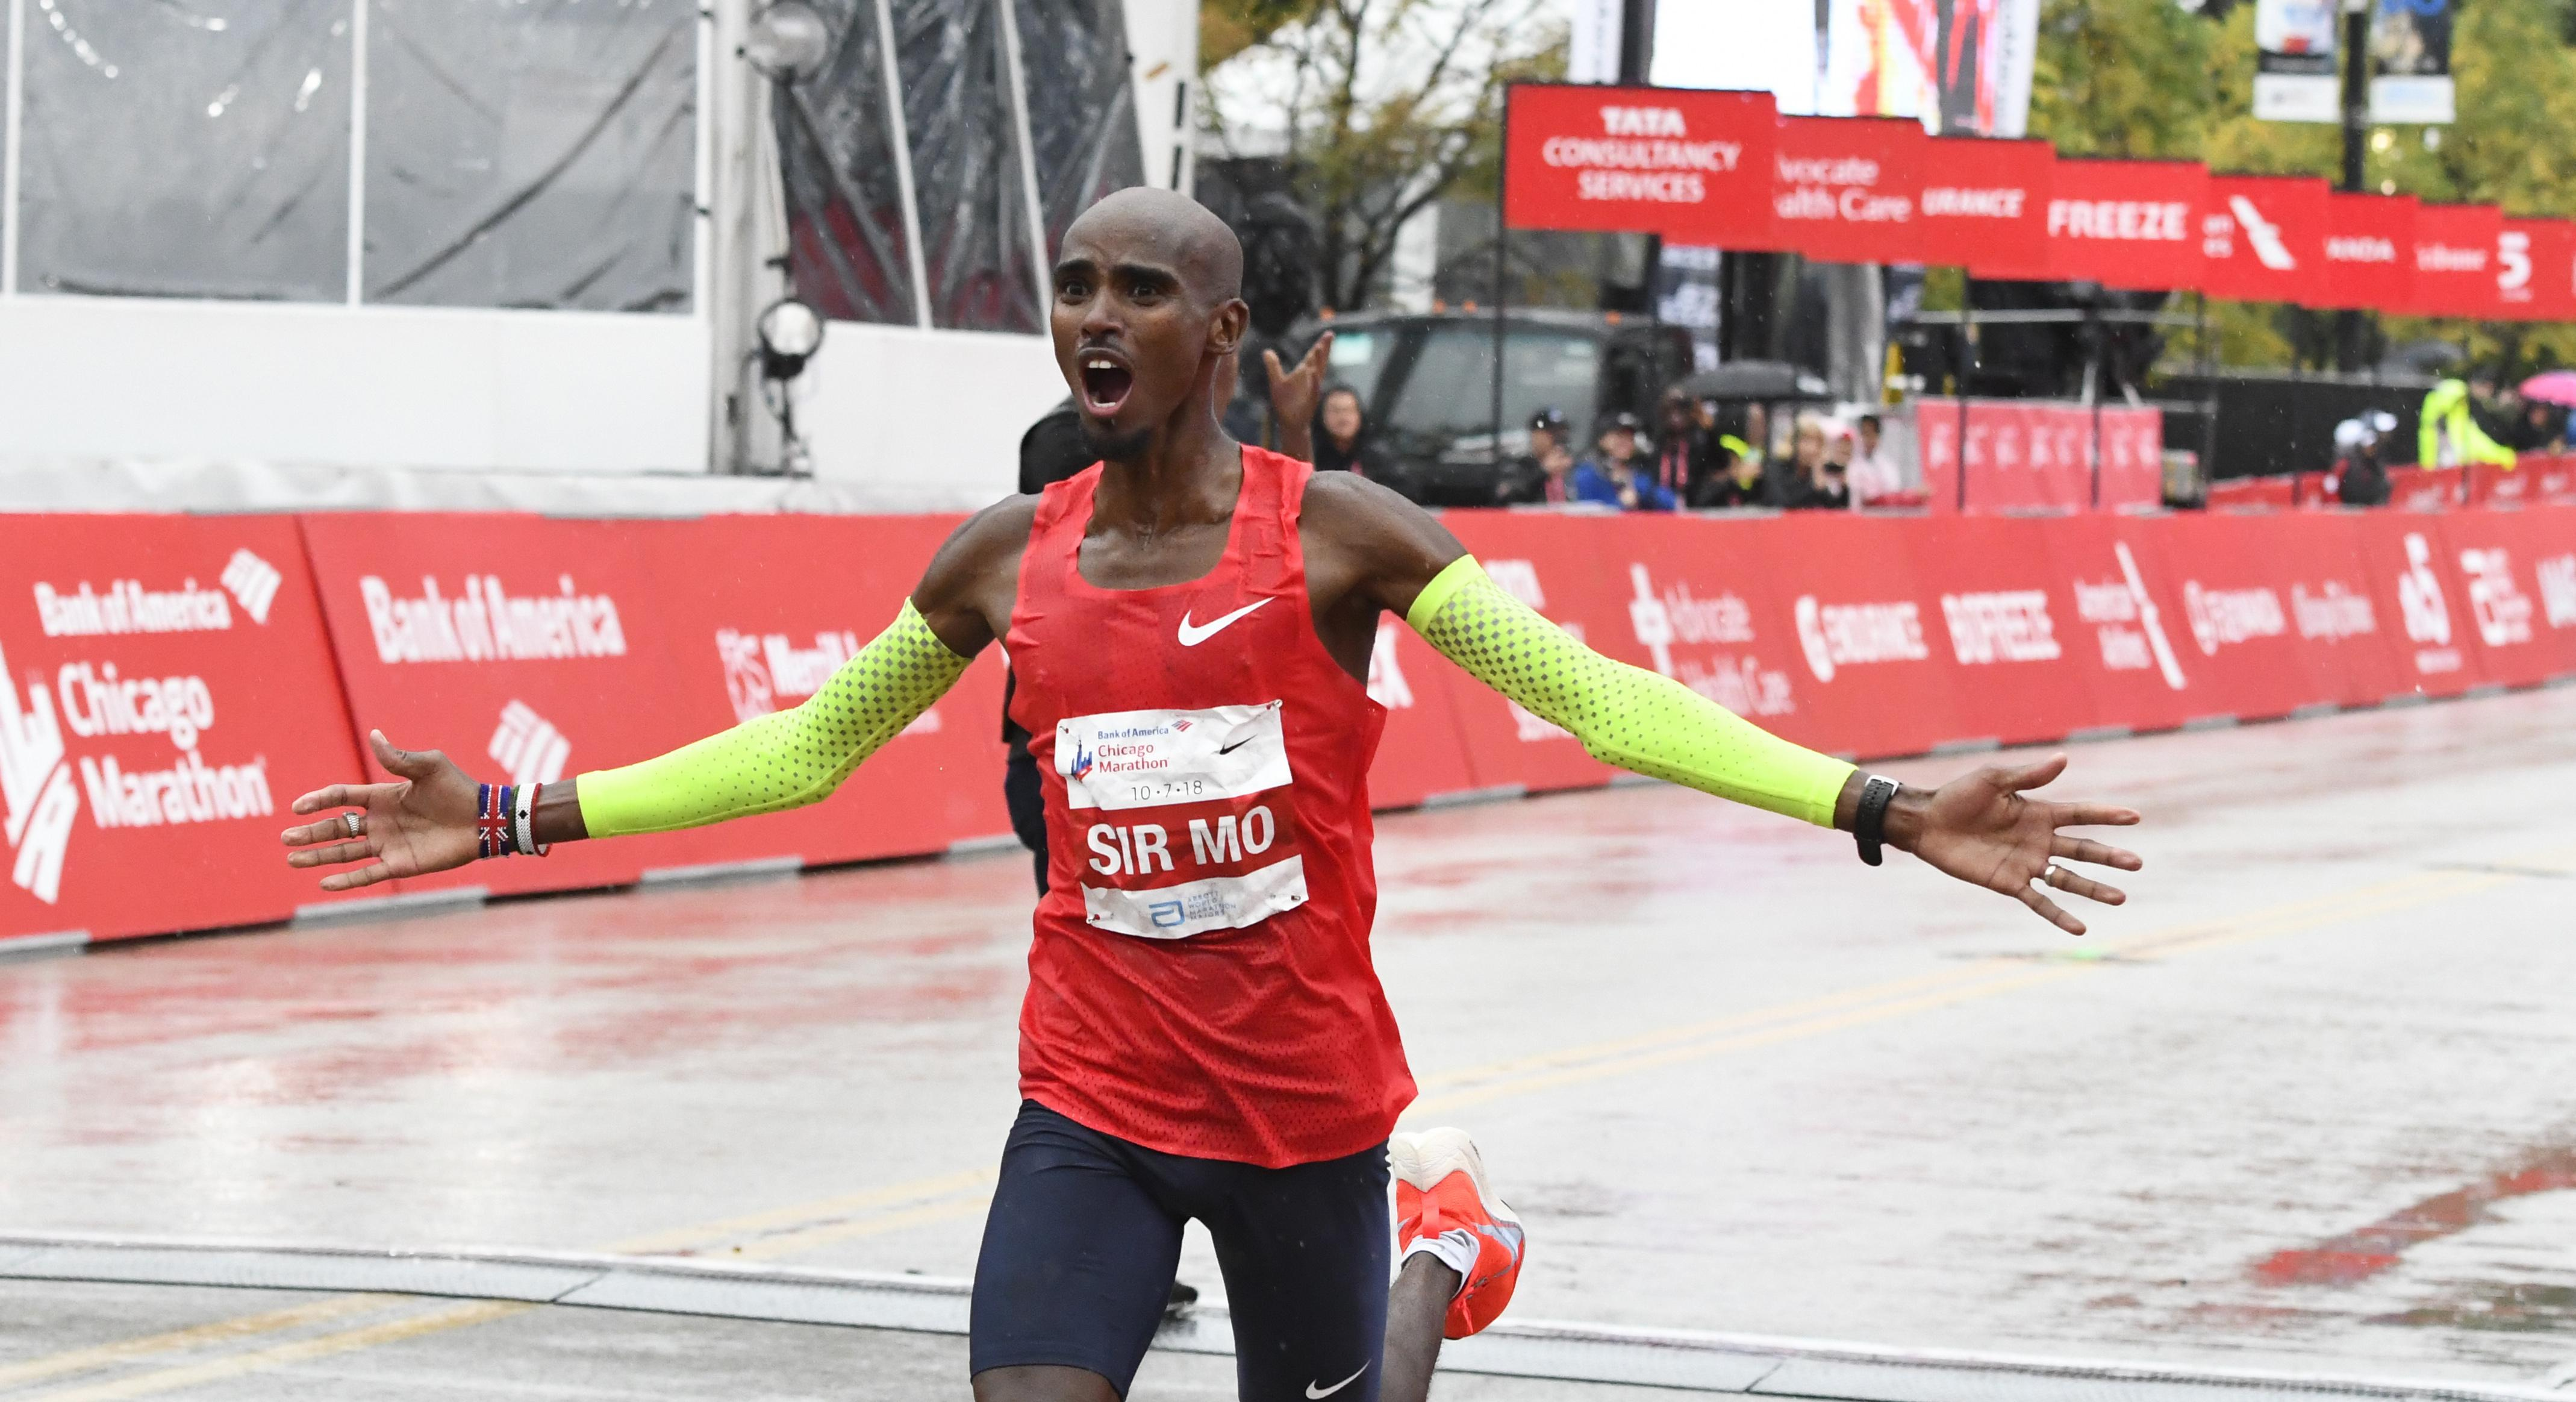 Mo Farah set a European record as he won the Chicago Marathon